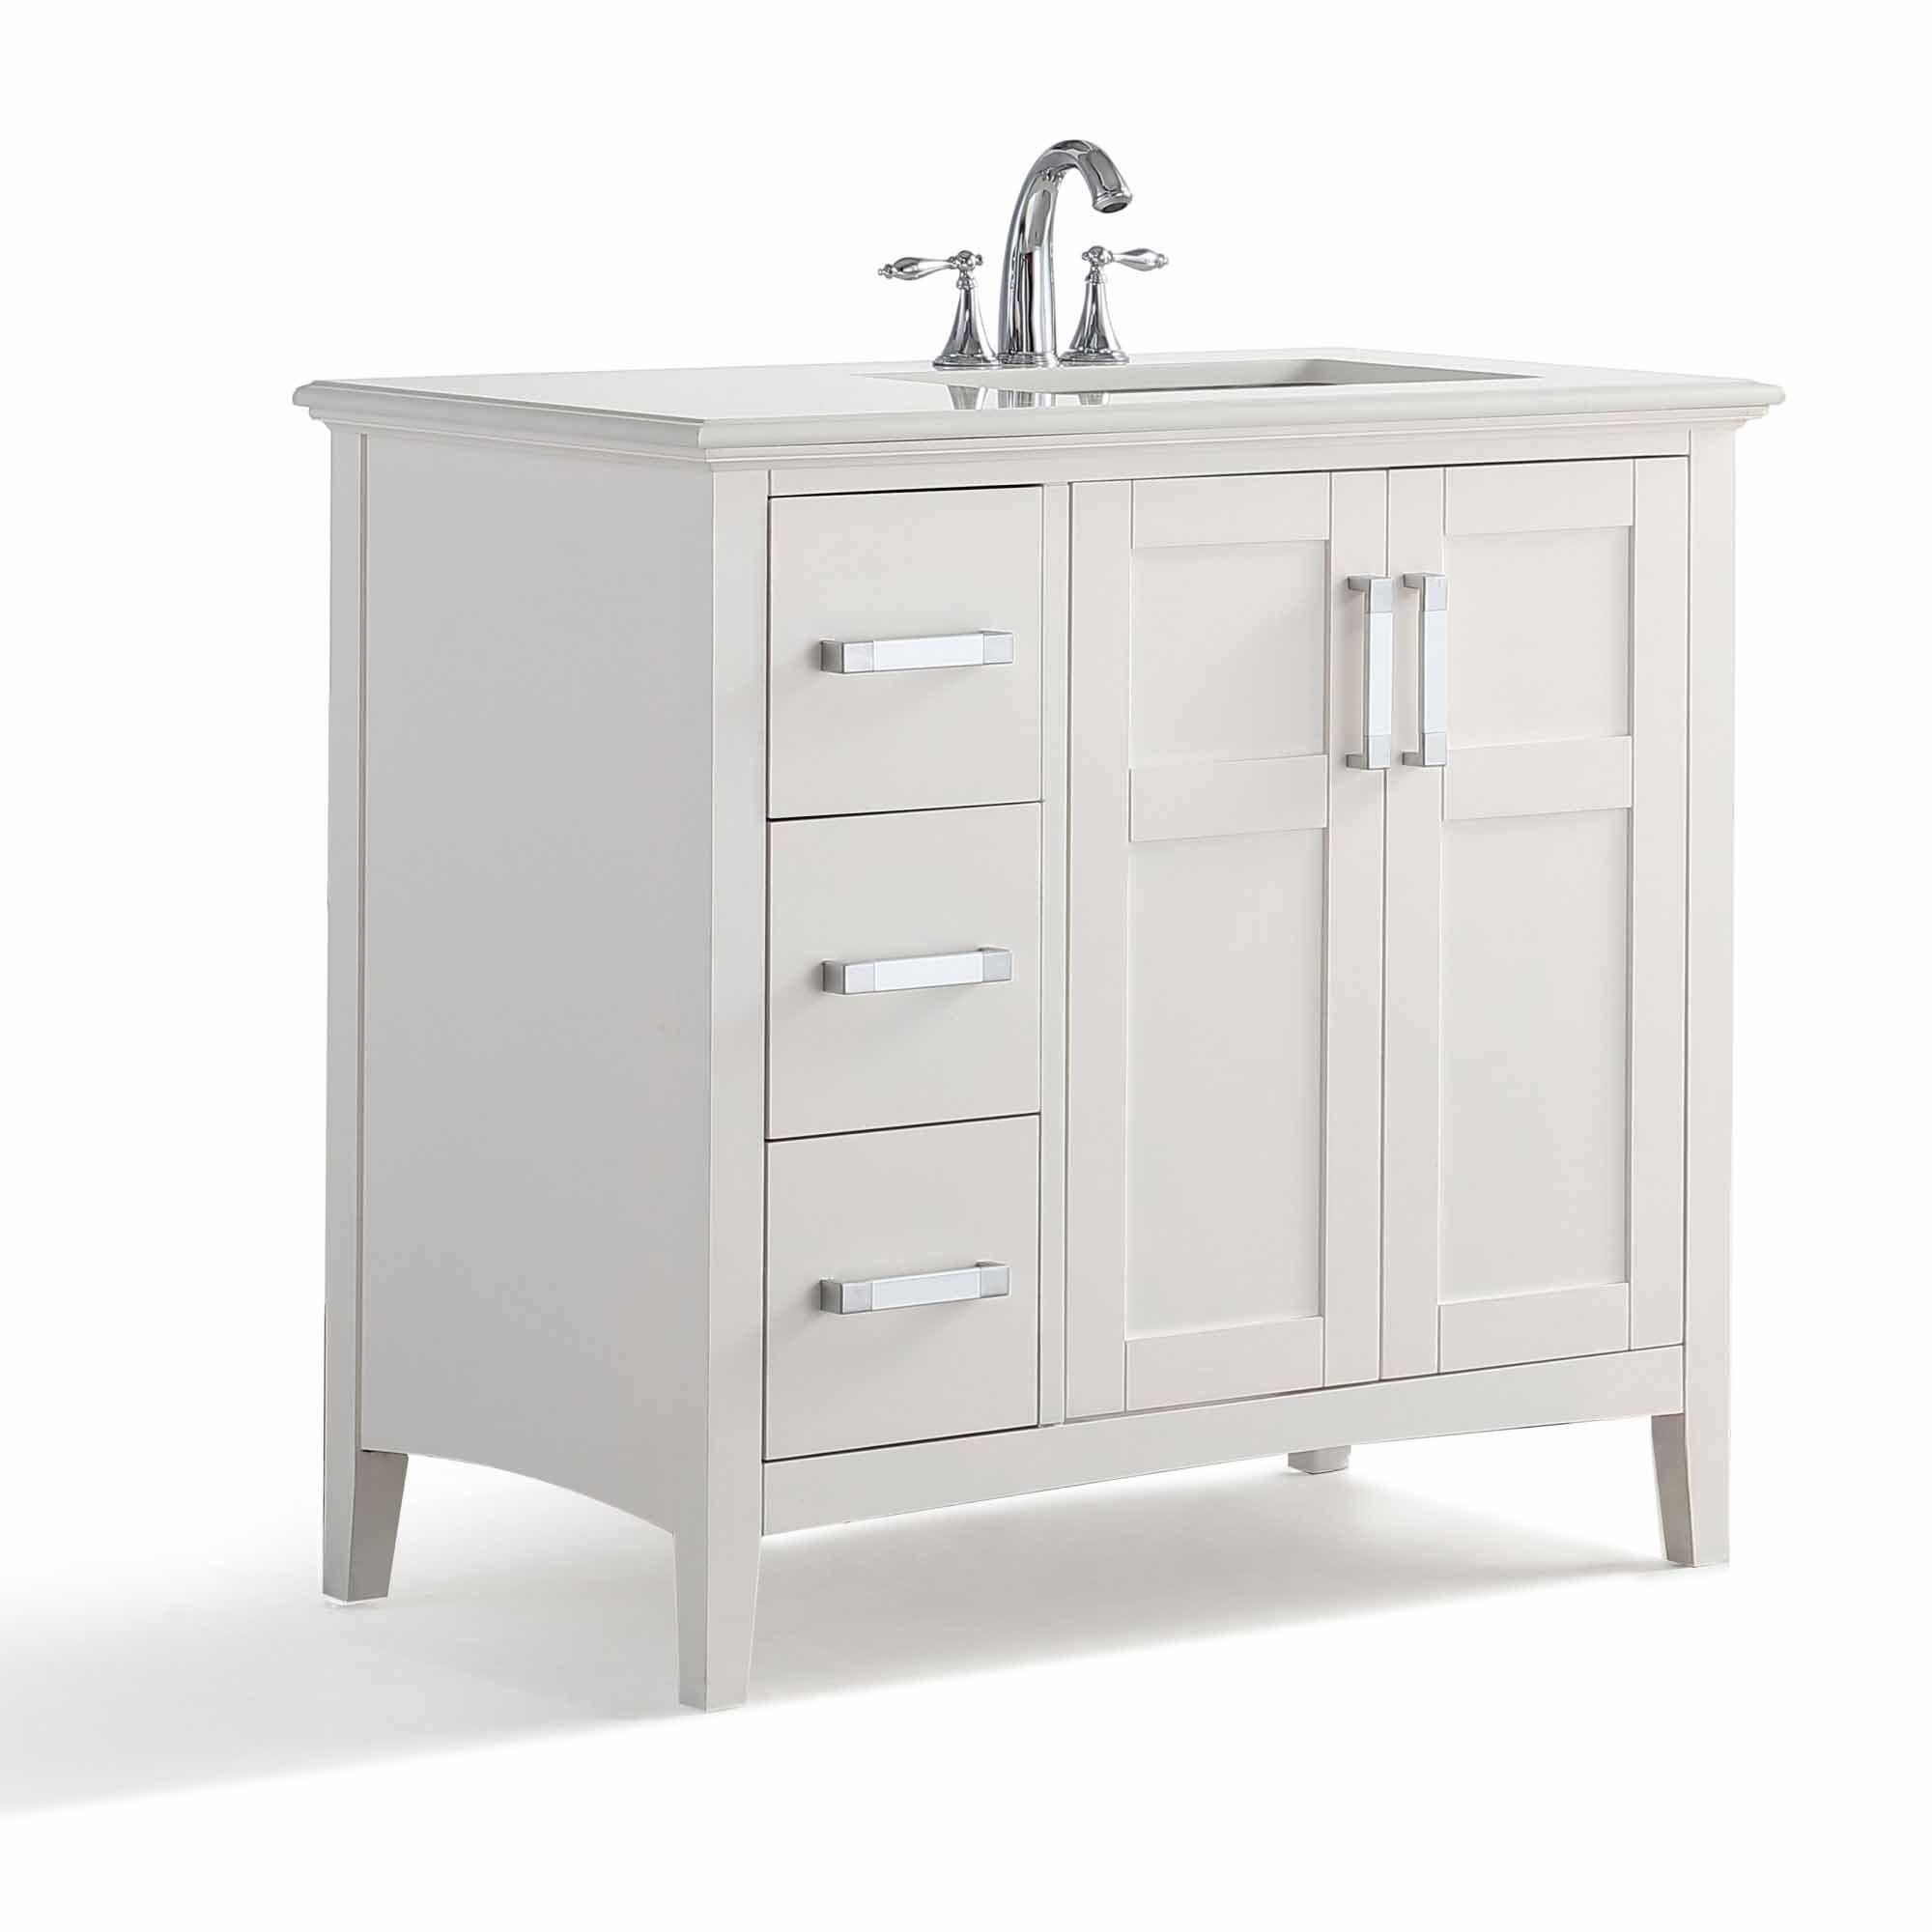 36 Inch Winston Black Bath Vanity Simpli Home Single Bathroom Vanity Marble Vanity Tops Single Sink Bathroom Vanity